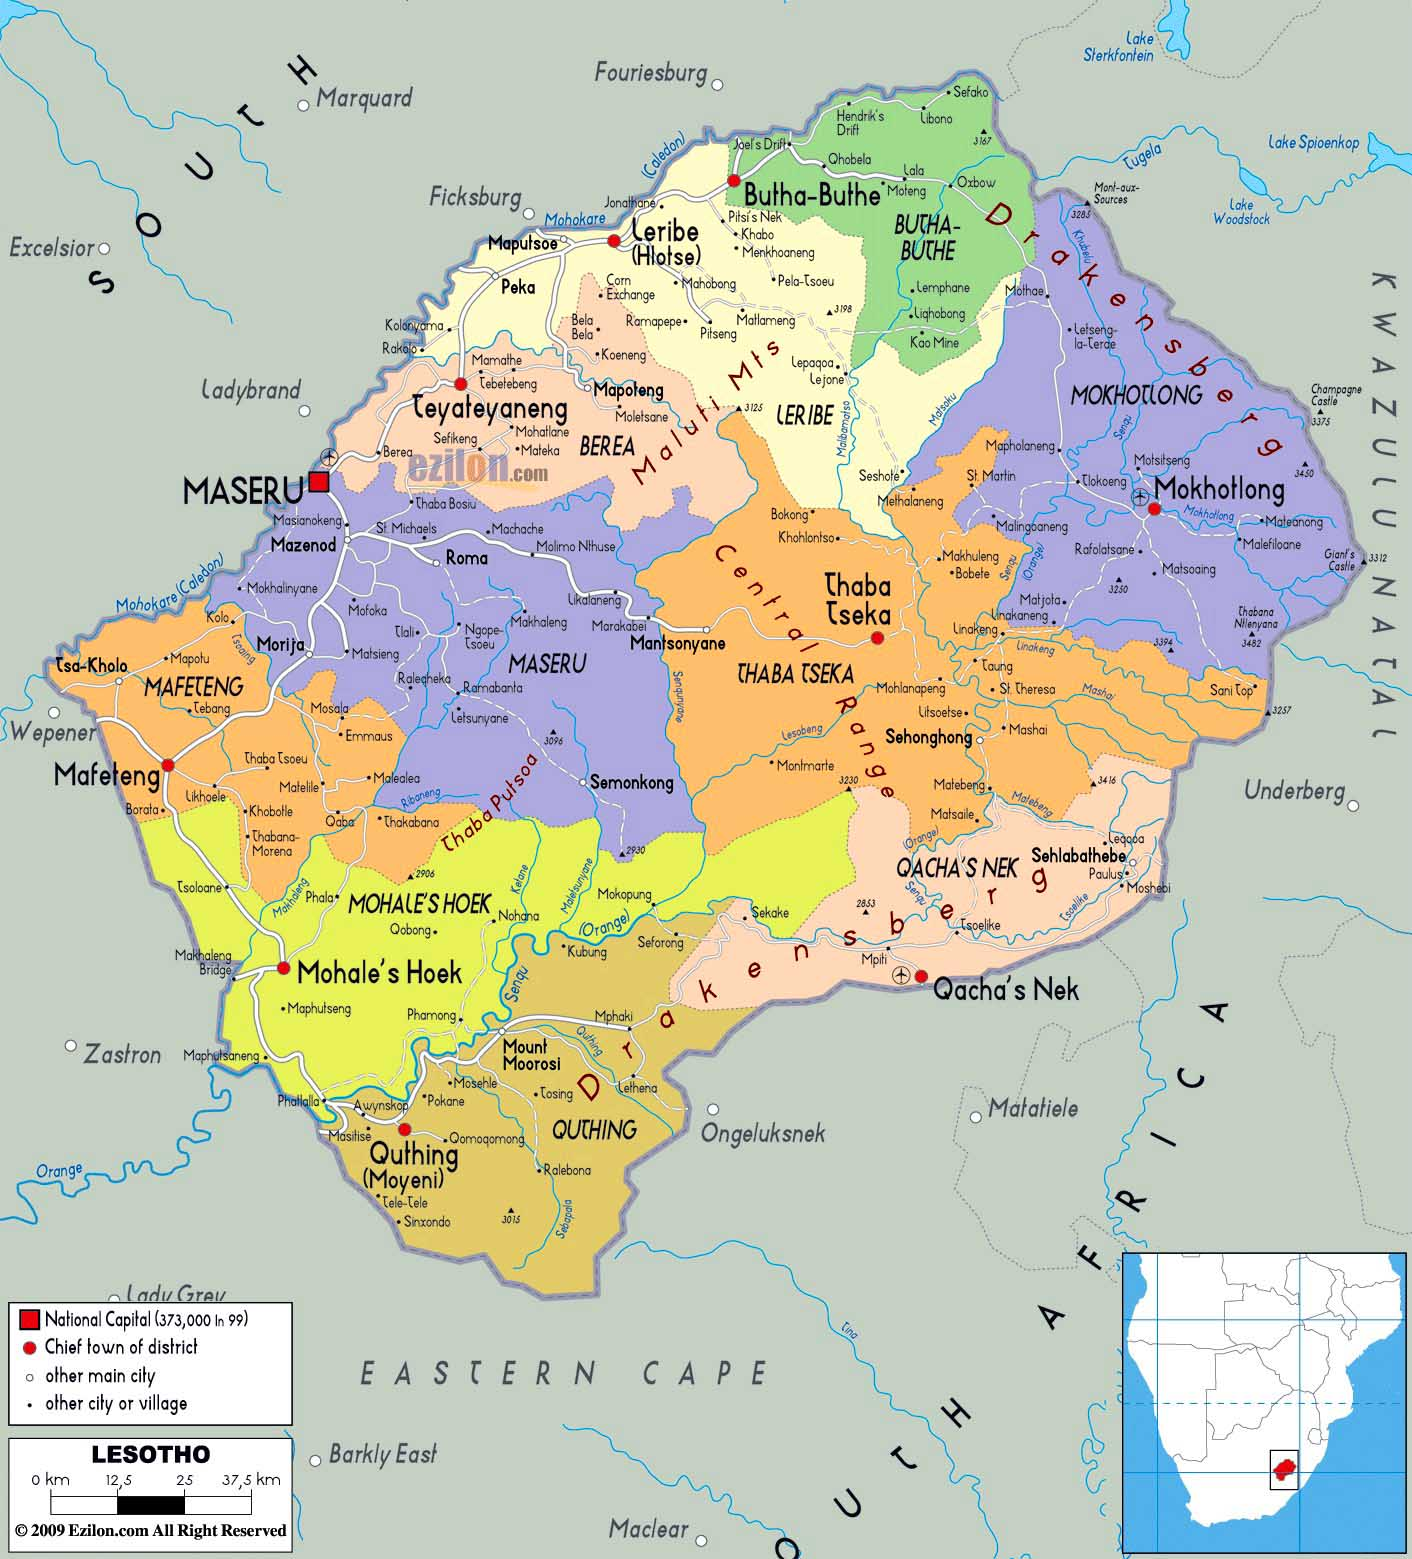 Worldrecordtour Africa Southern Africa Lesotho Maseru Kingdom - maseru map